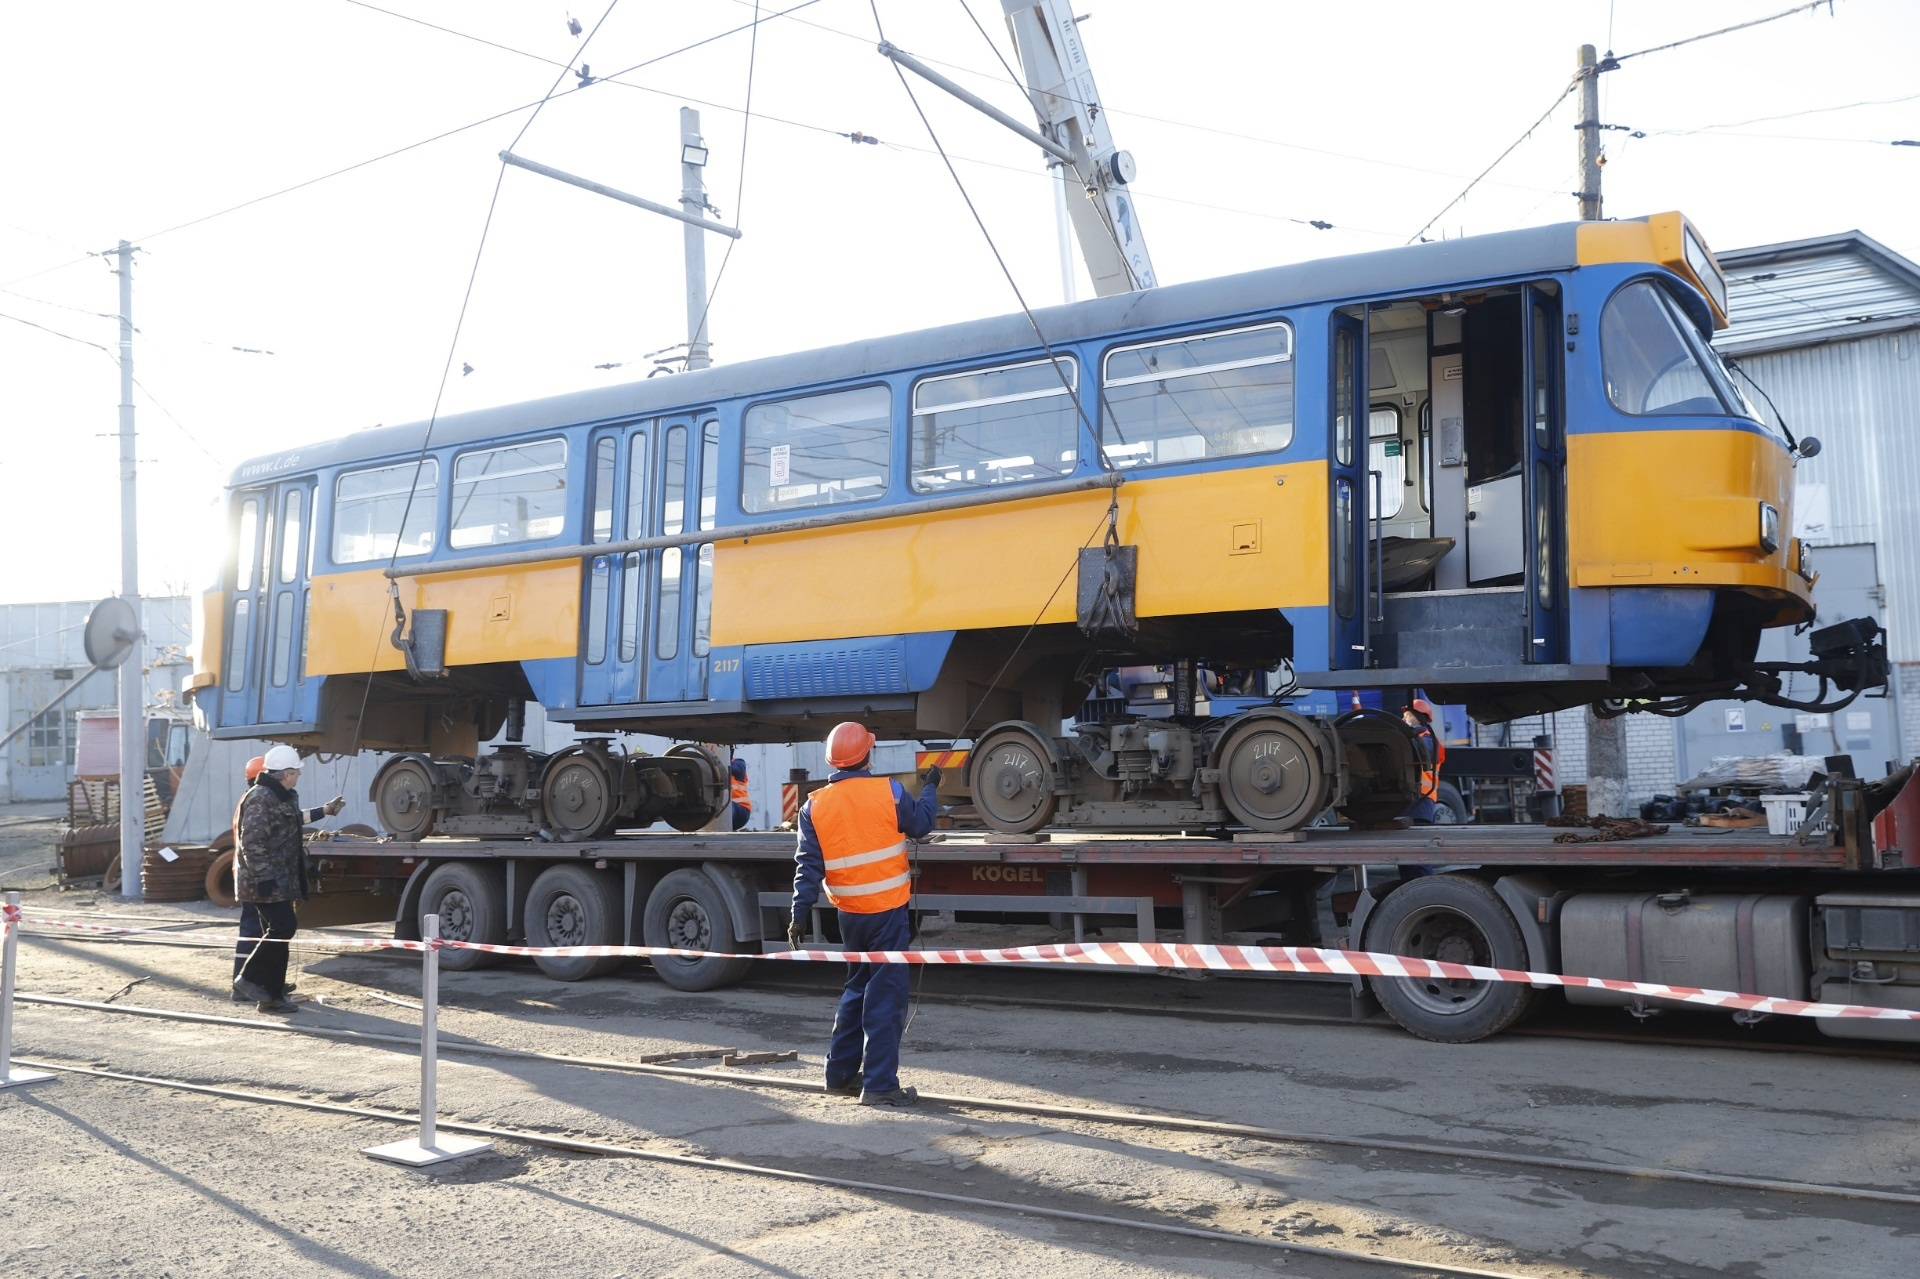 10 трамваев. Новости Днепра